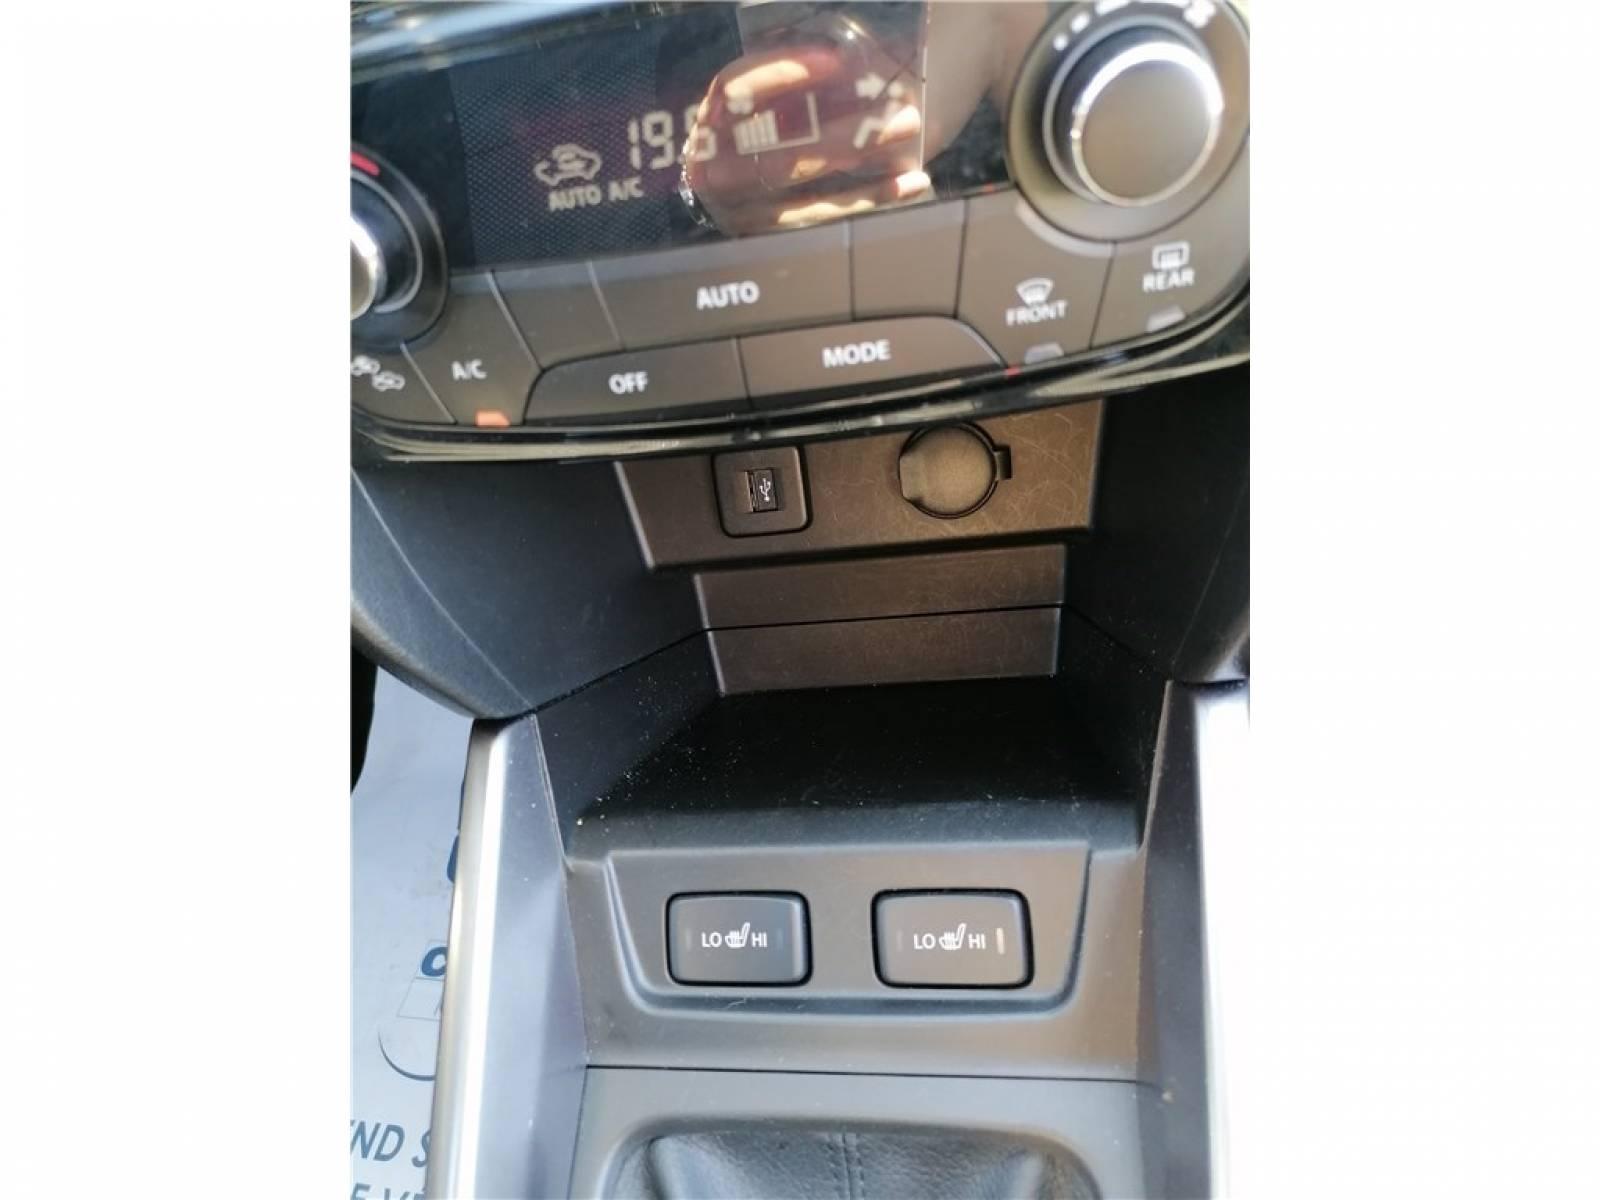 SUZUKI Vitara 1.0 Boosterjet - véhicule d'occasion - Groupe Guillet - Opel Magicauto - Chalon-sur-Saône - 71380 - Saint-Marcel - 38